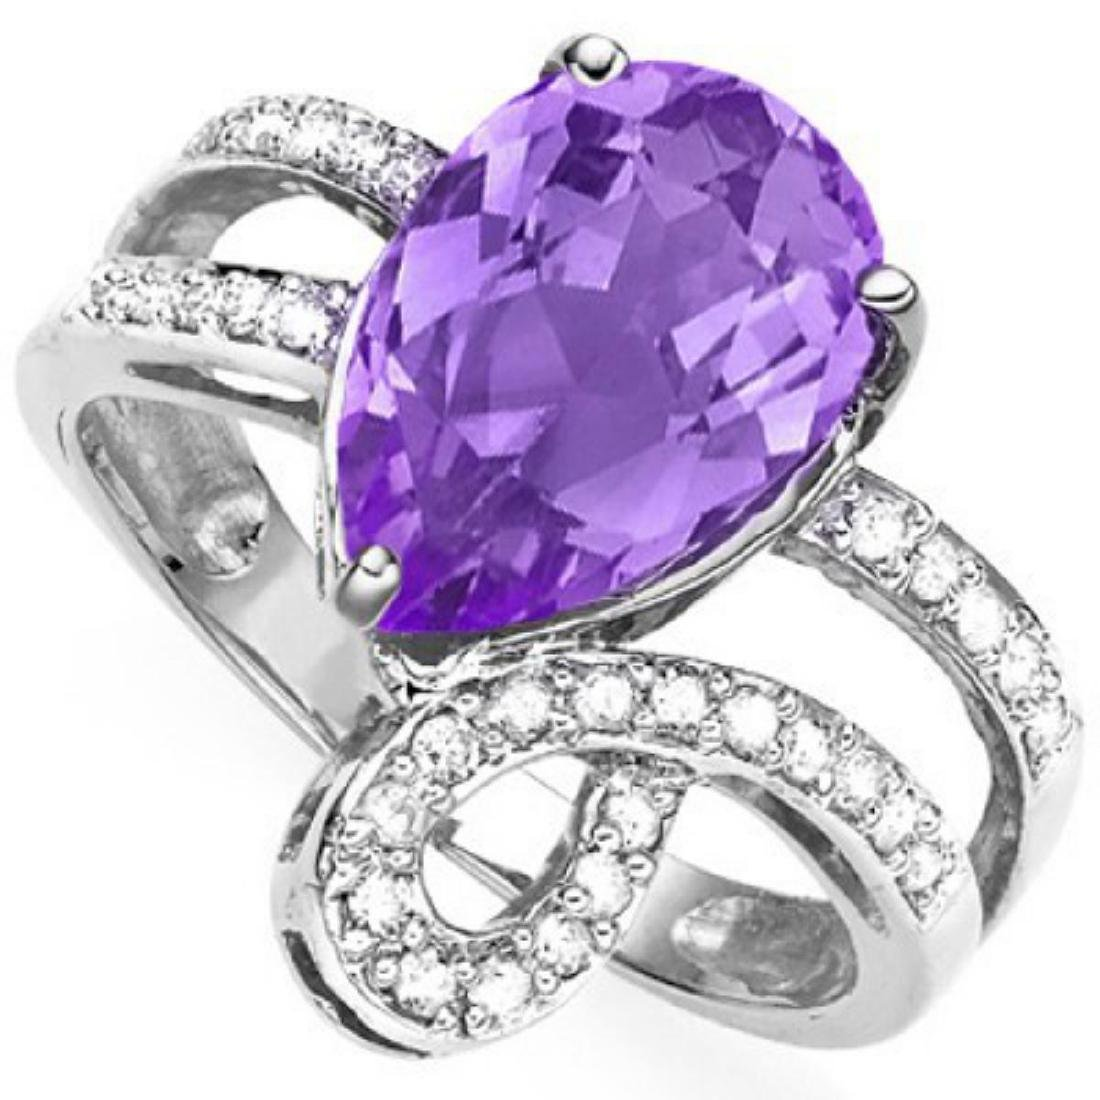 Stunning Natural Amethyst & Diamond Ring